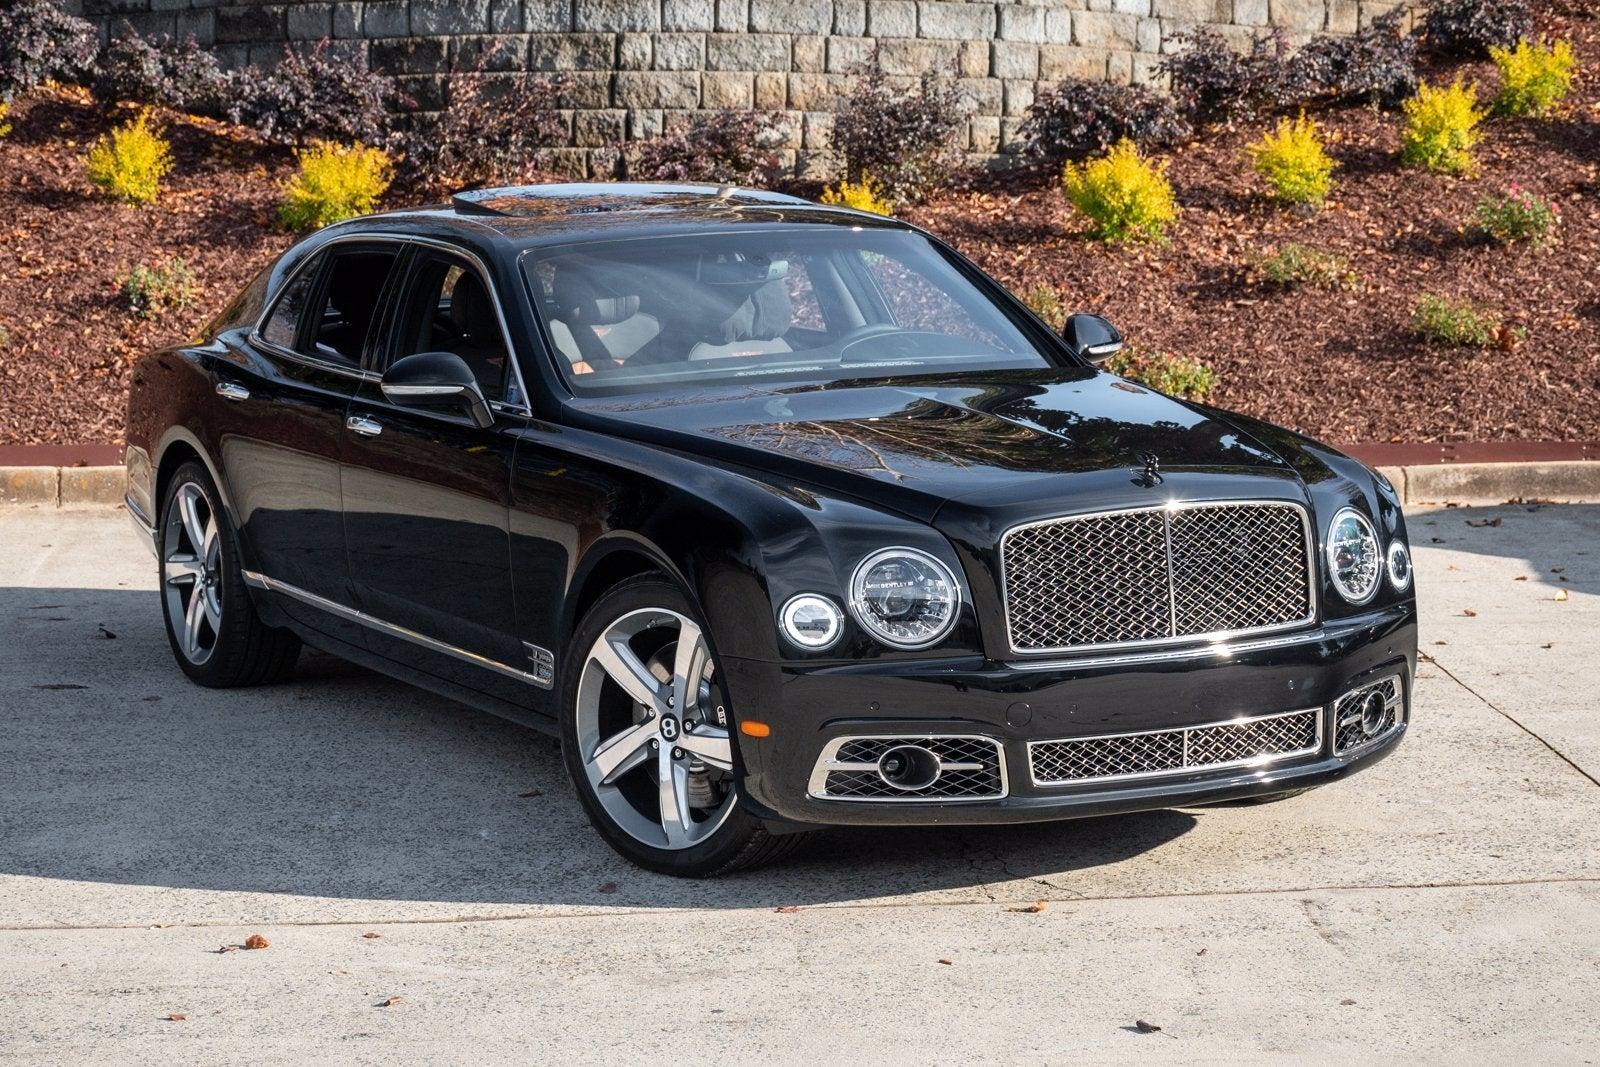 2020 Bentley Mulsanne Speed Charlotte Nc Cornelius Davidson Huntersville North Carolina Scbbt7zh2lc004719